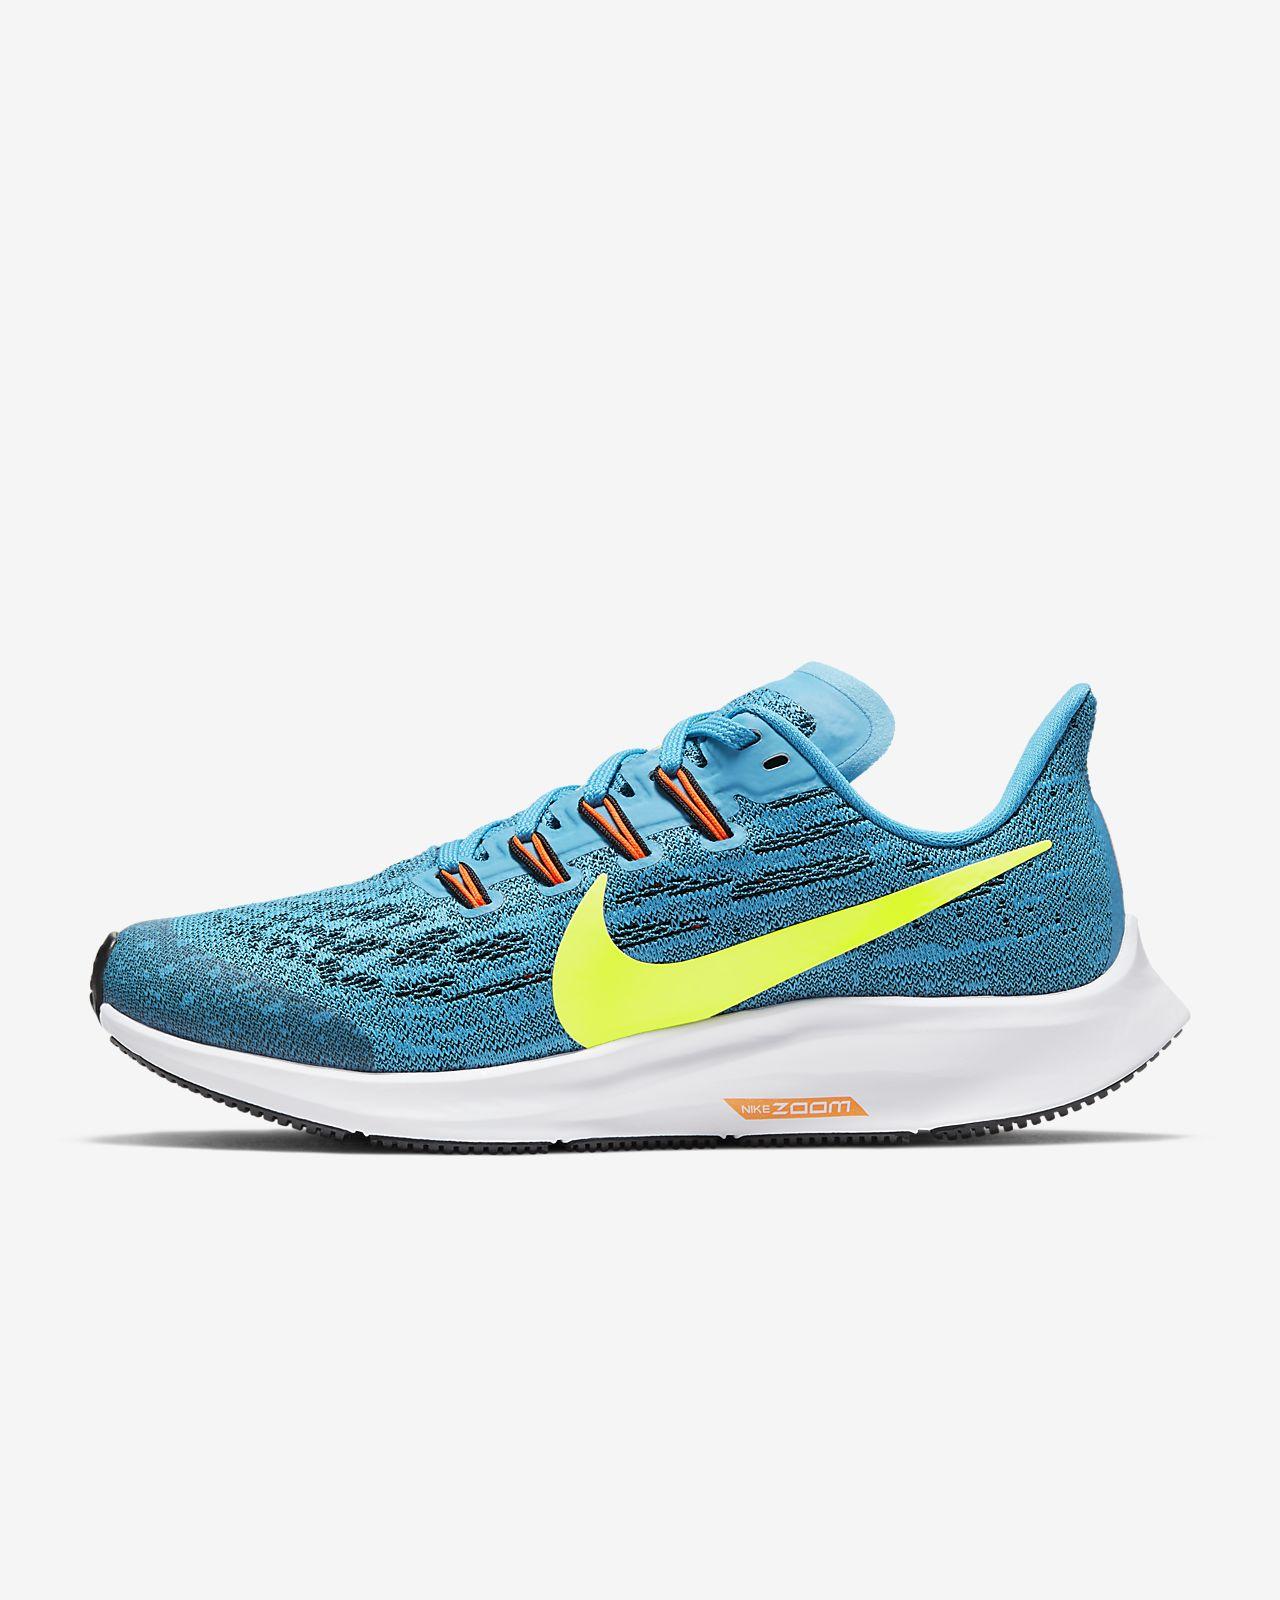 Nike Air Zoom Pegasus 36 Laufschuh für jüngereältere Kinder